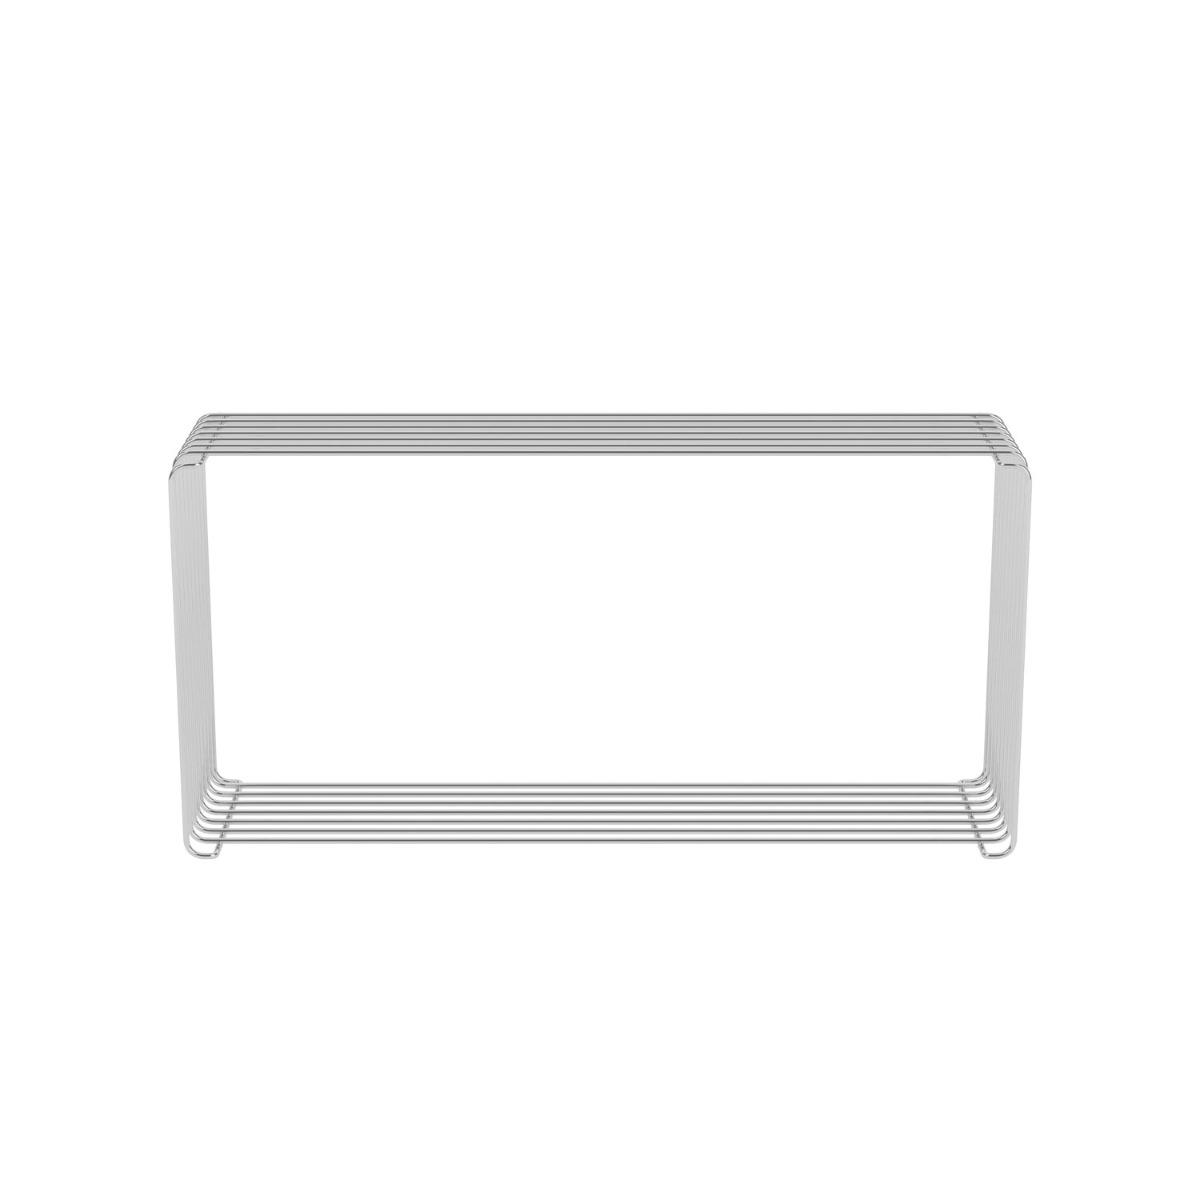 Montana Förvaringsmodul Wire 70x18,8cm Chrome